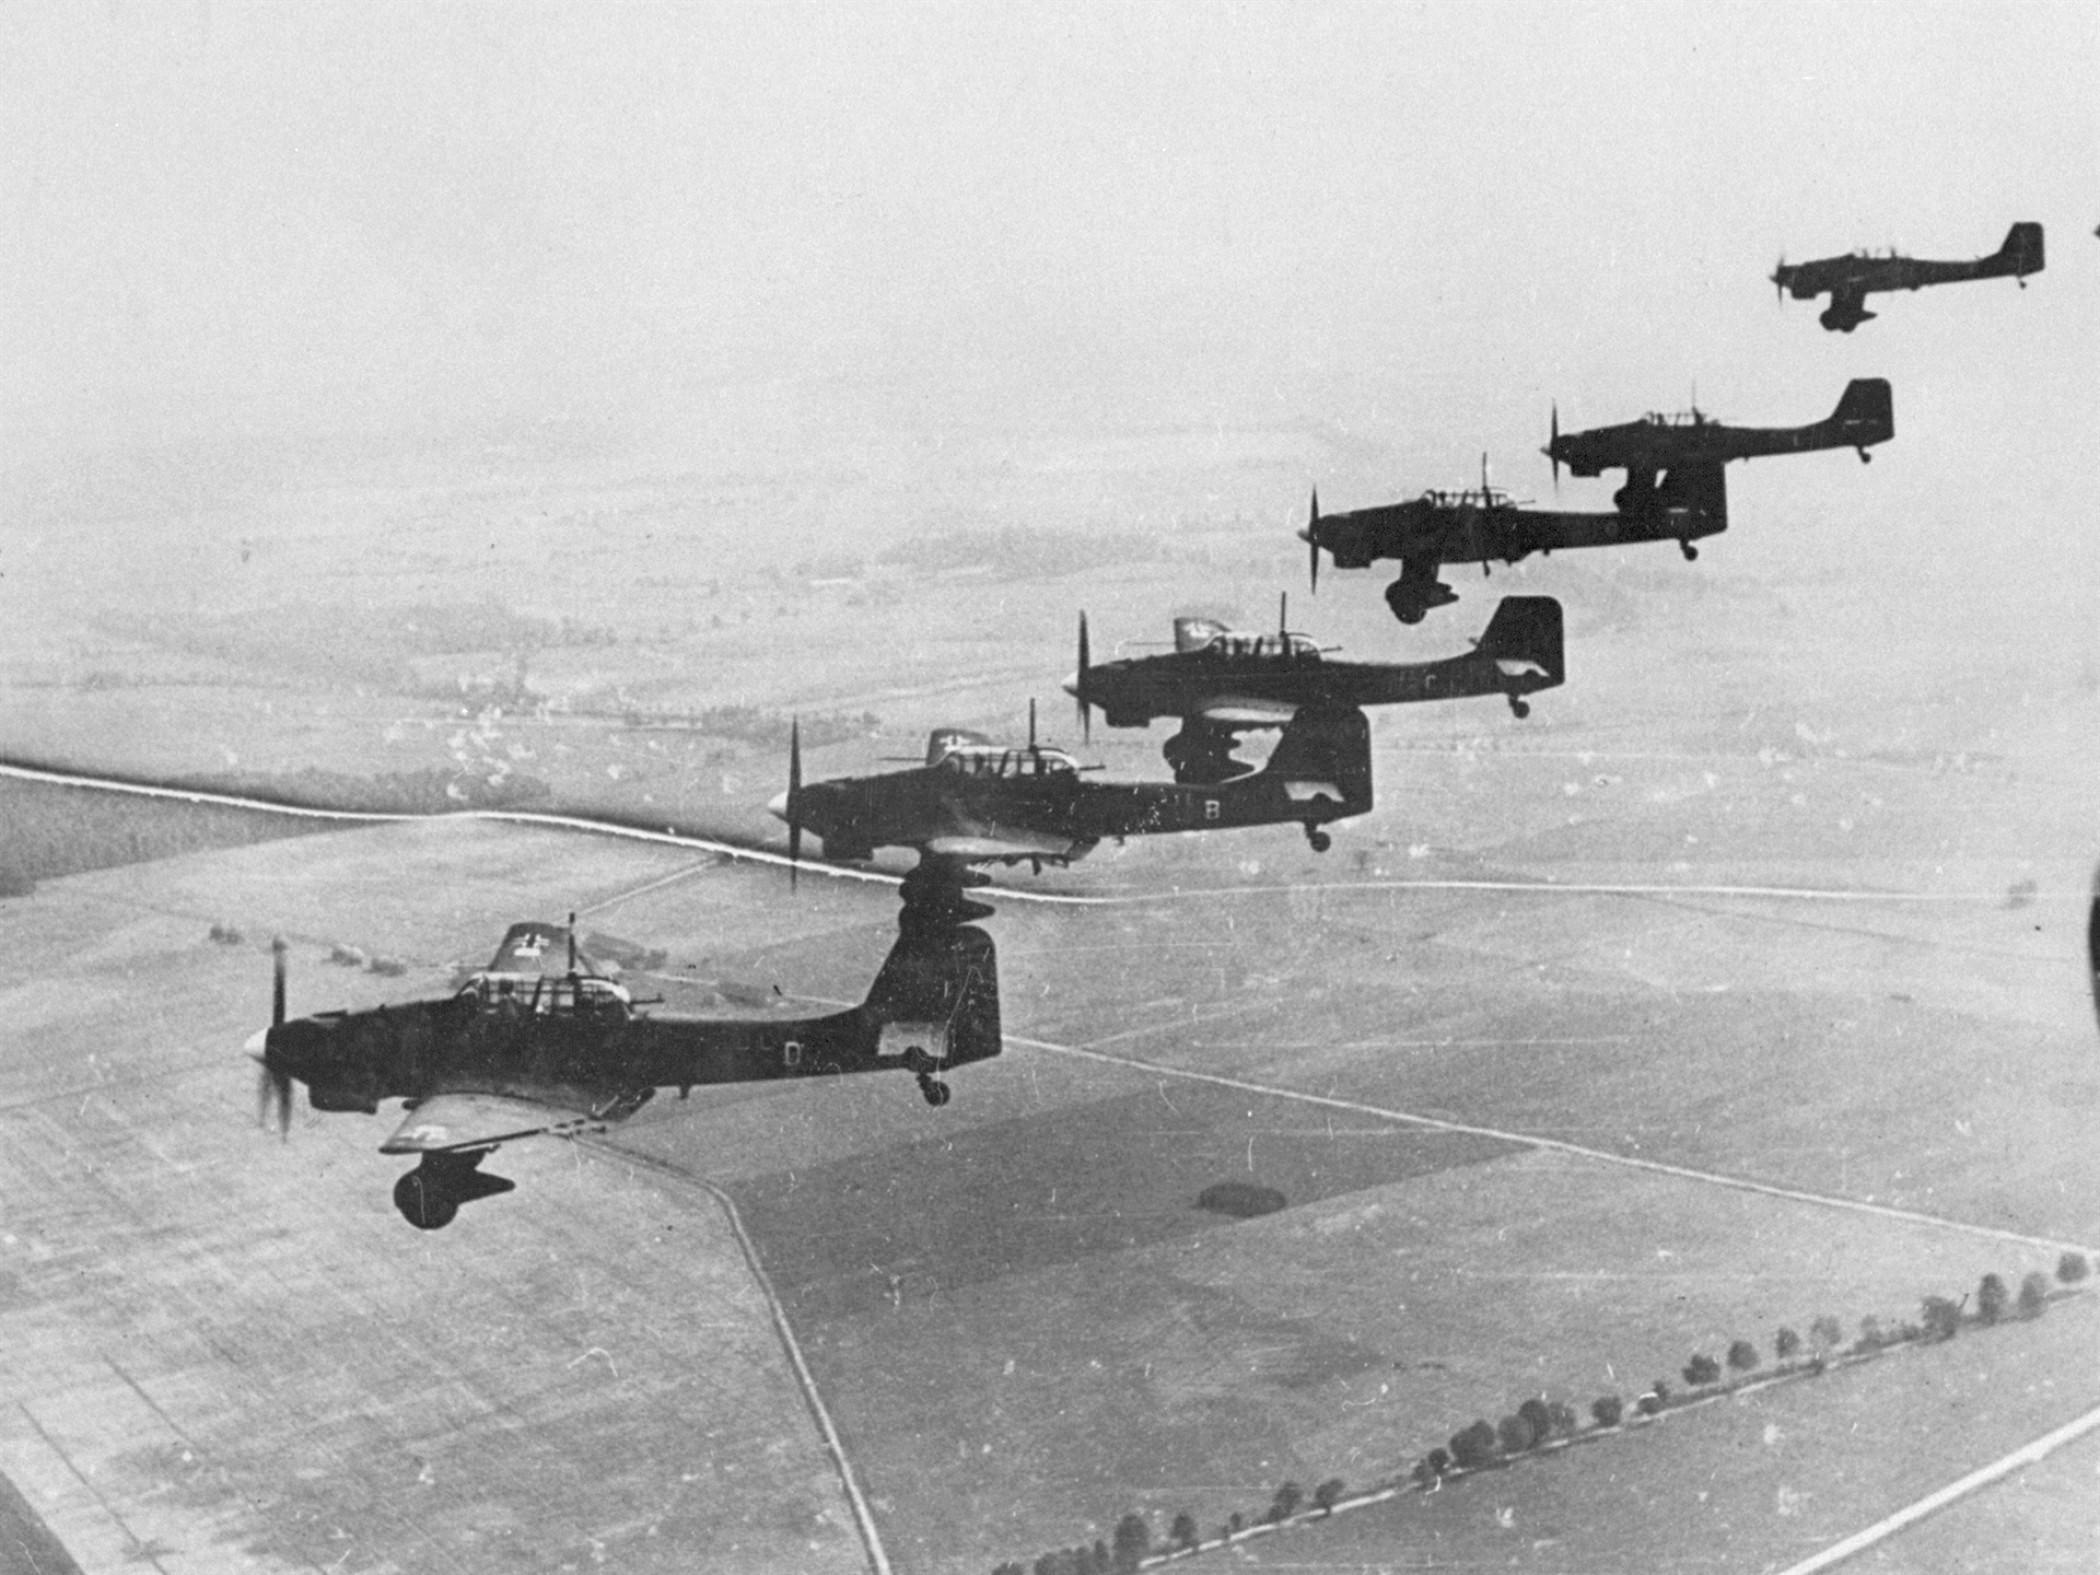 World war ii airplanes